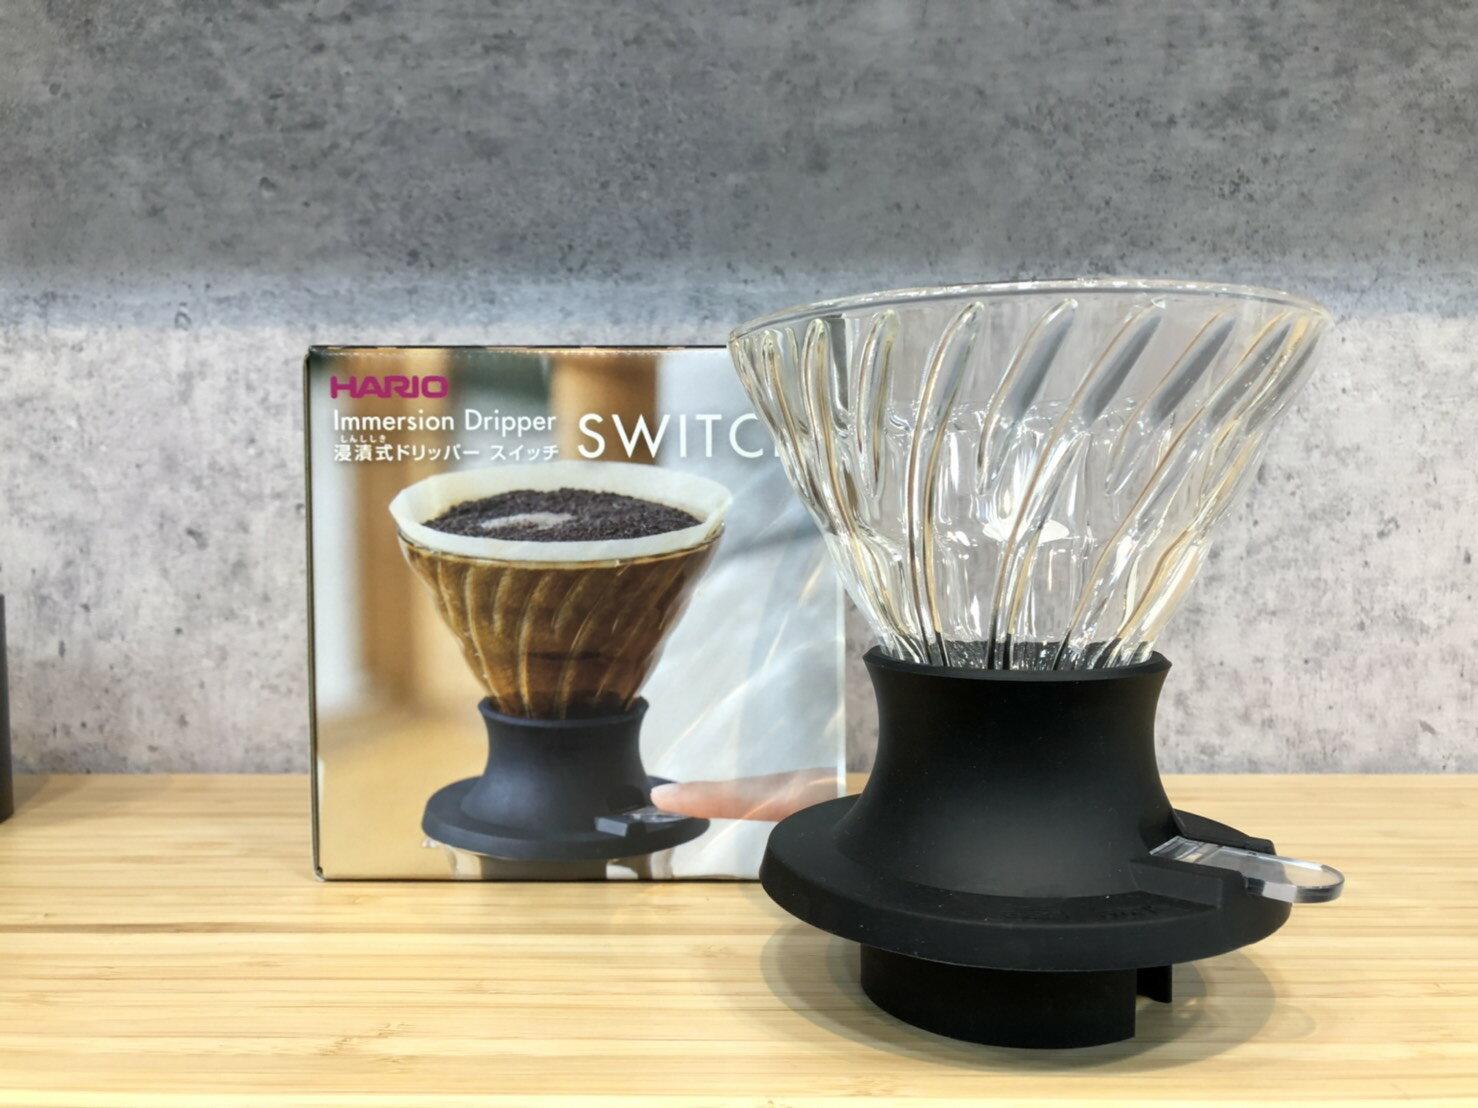 Hario SSD-200 浸泡式 浸漬式 咖啡聰明濾杯 V60 『93 coffee wholesale』